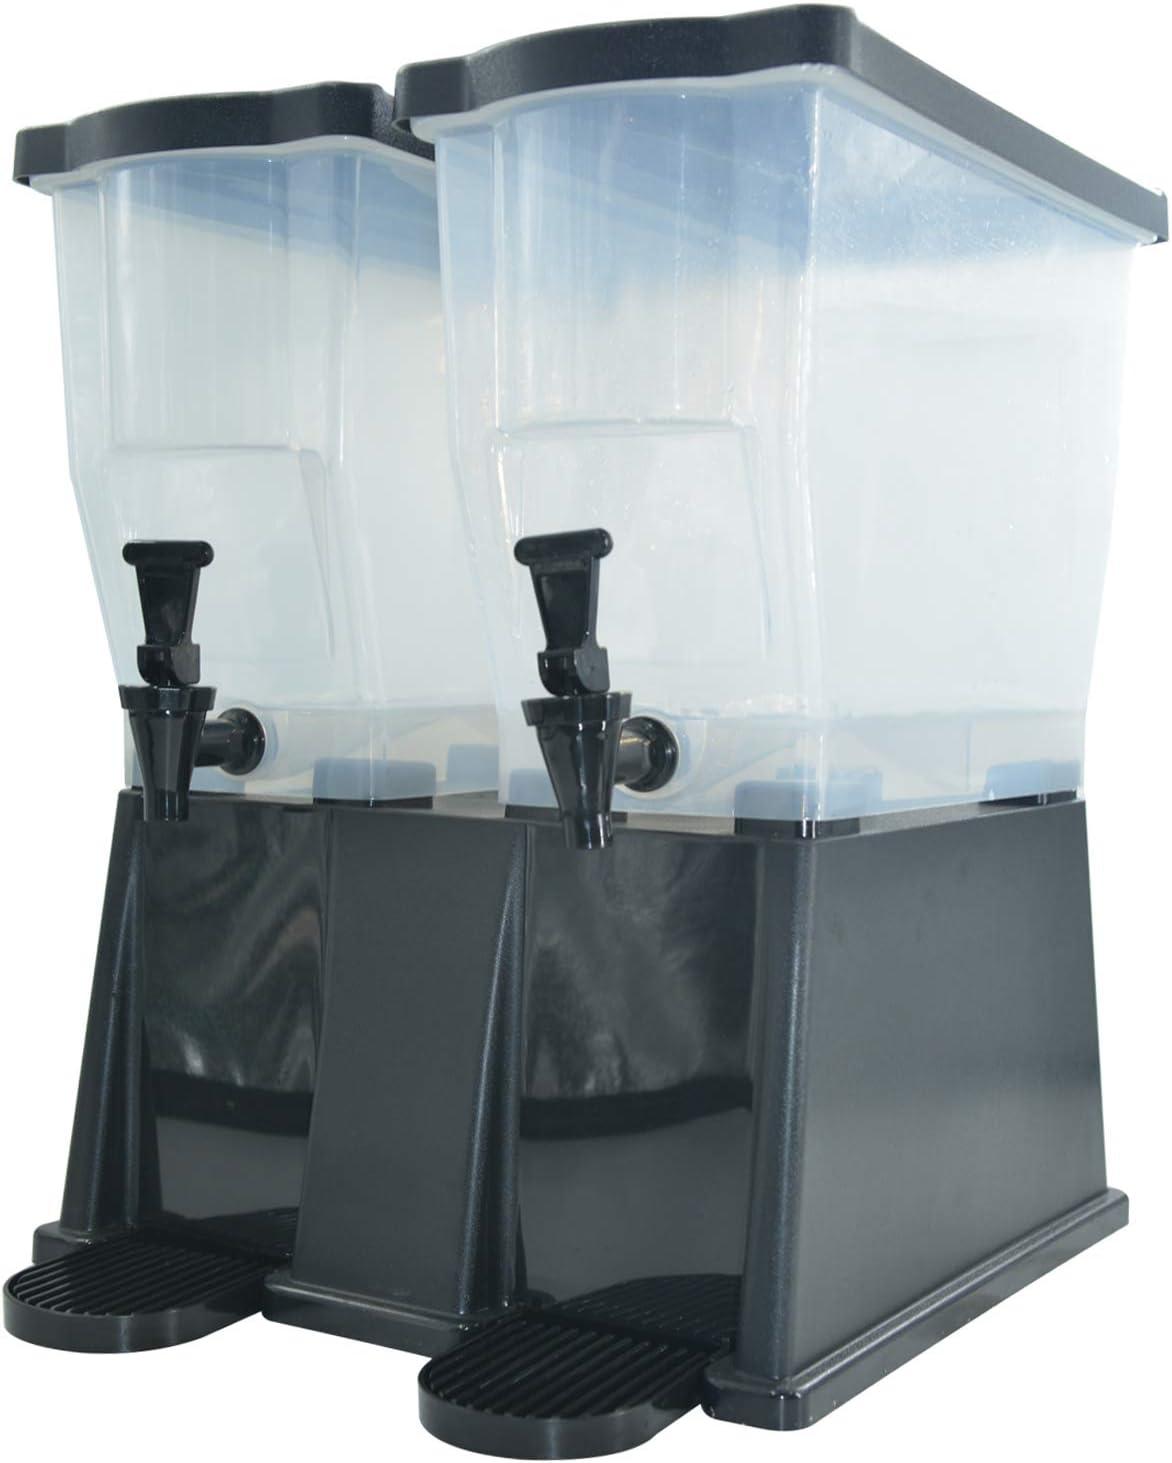 CMI Beverage Dispenser 7-Gallon clear (7 gallon),Double Base